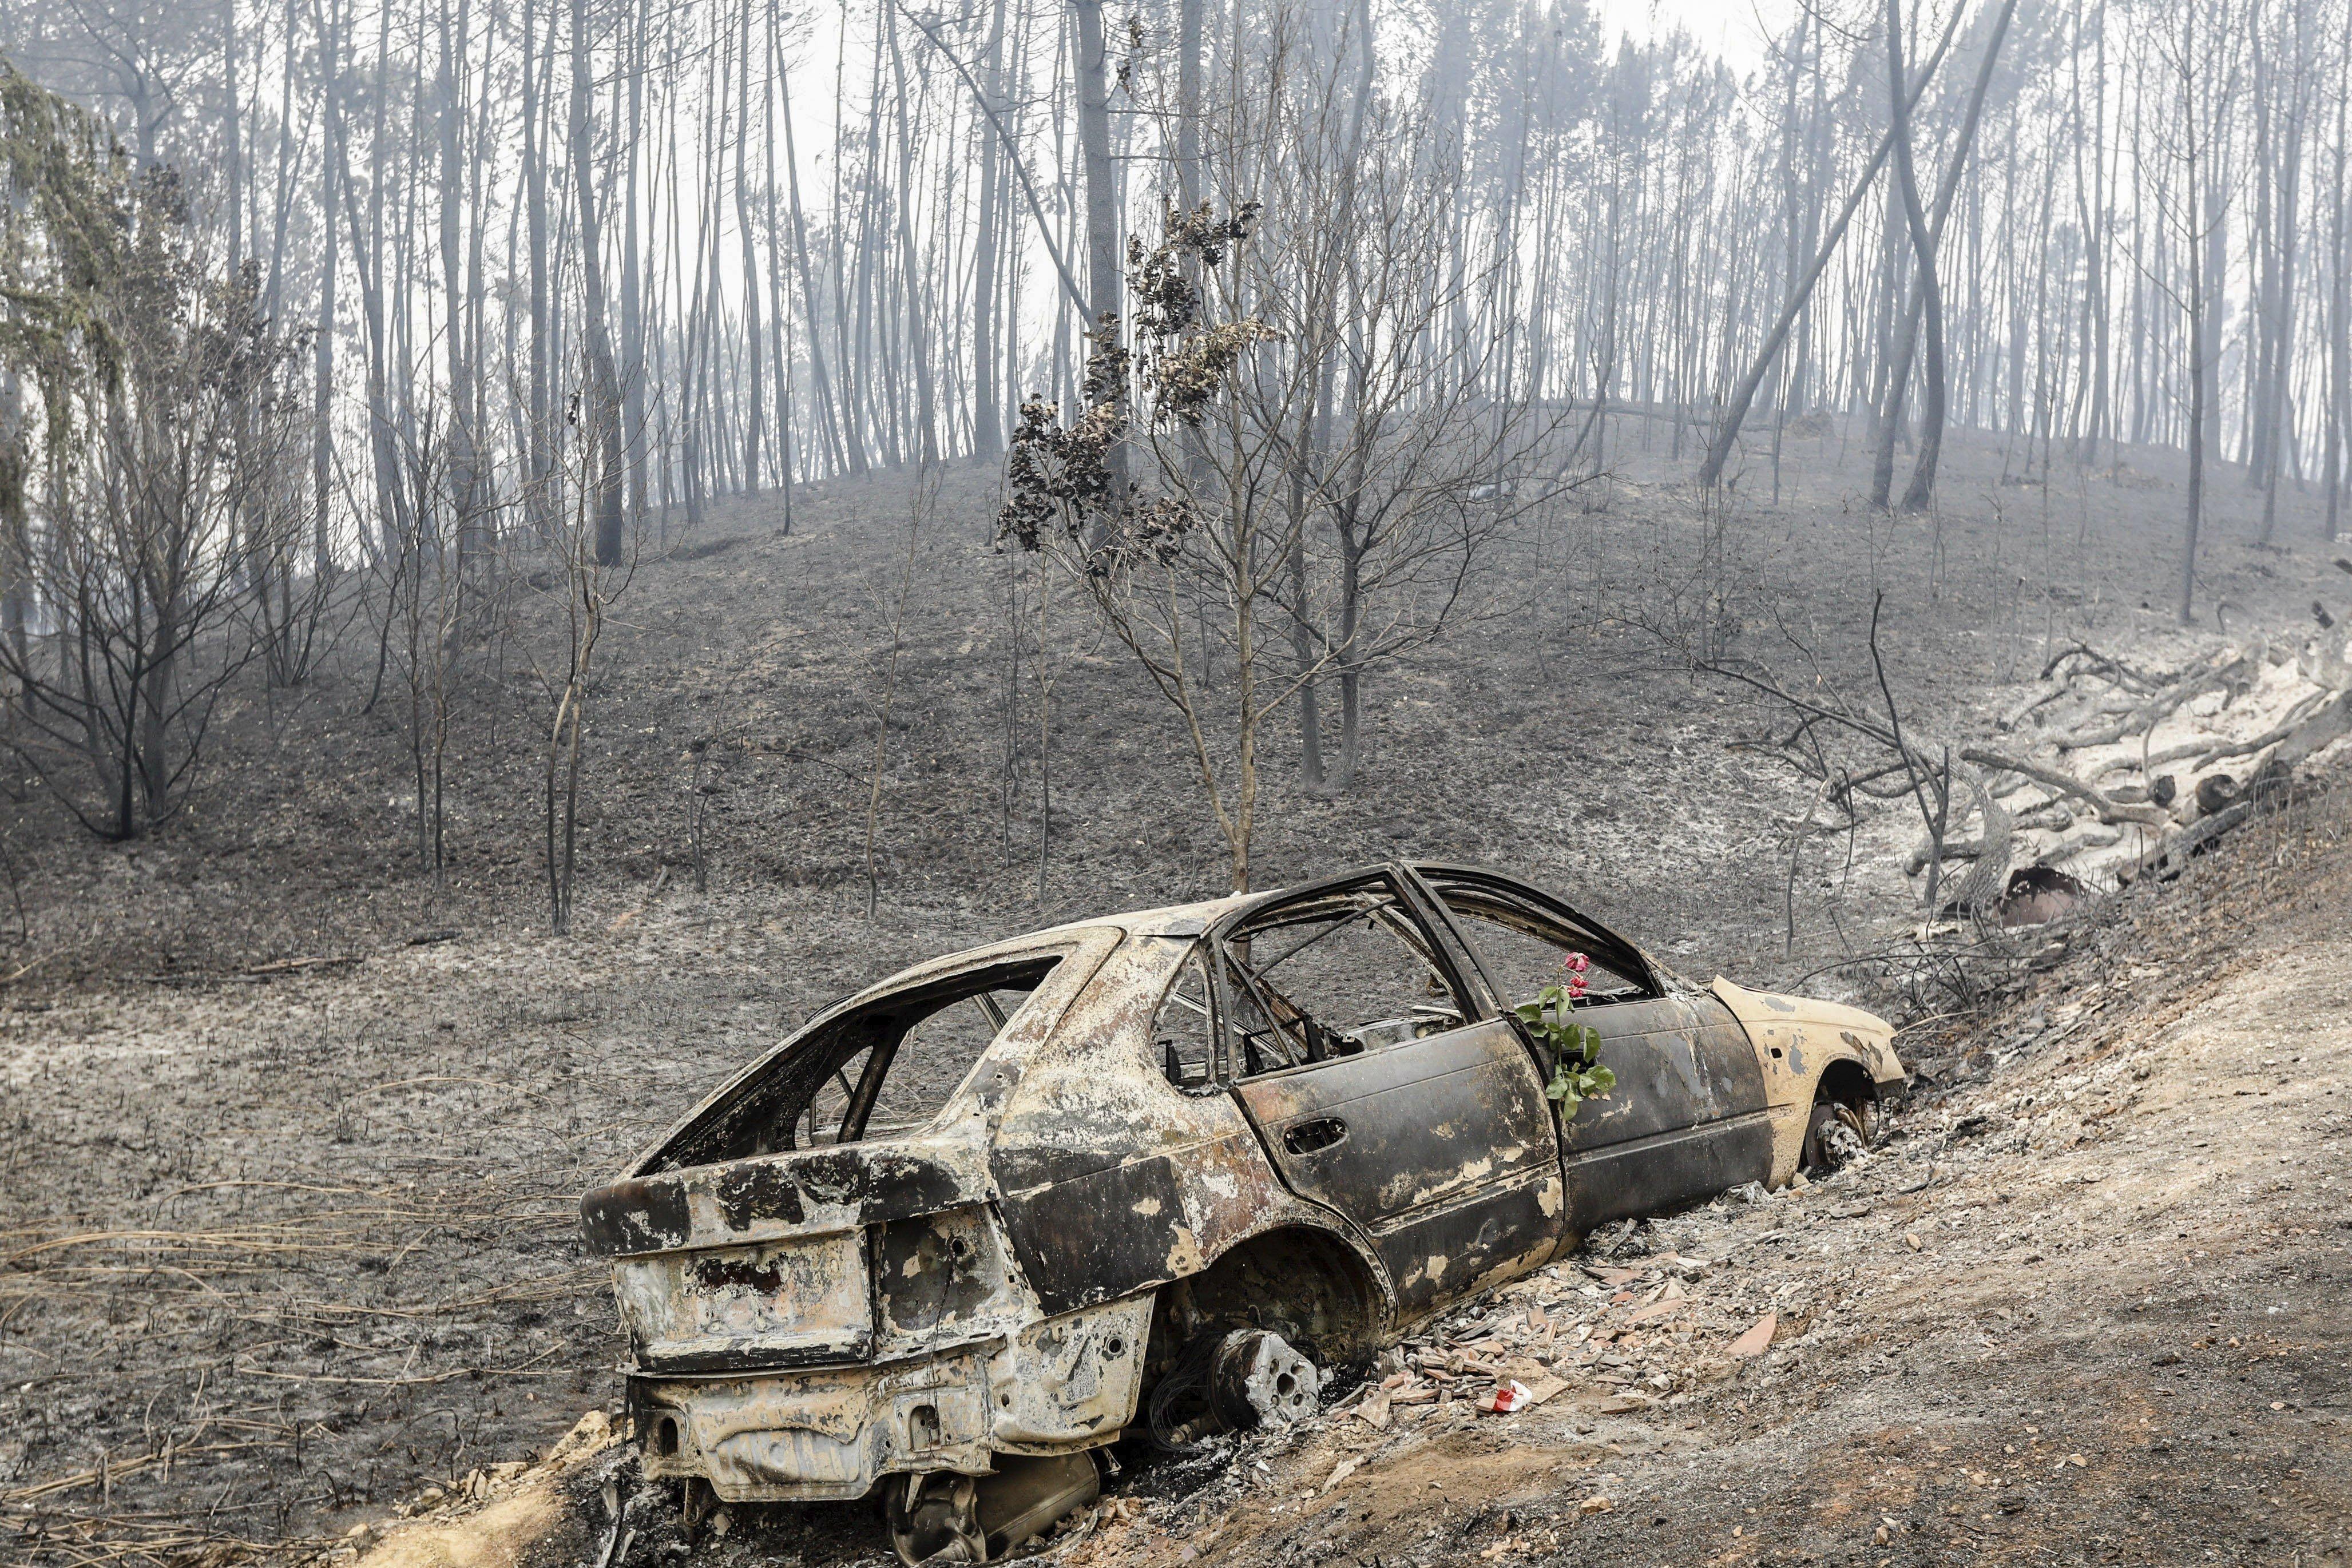 Un vehicle destrossat pel foc a Nodeirinho, prop de Pedrógão Gran (Portugal). /ANTONIO COTRIM